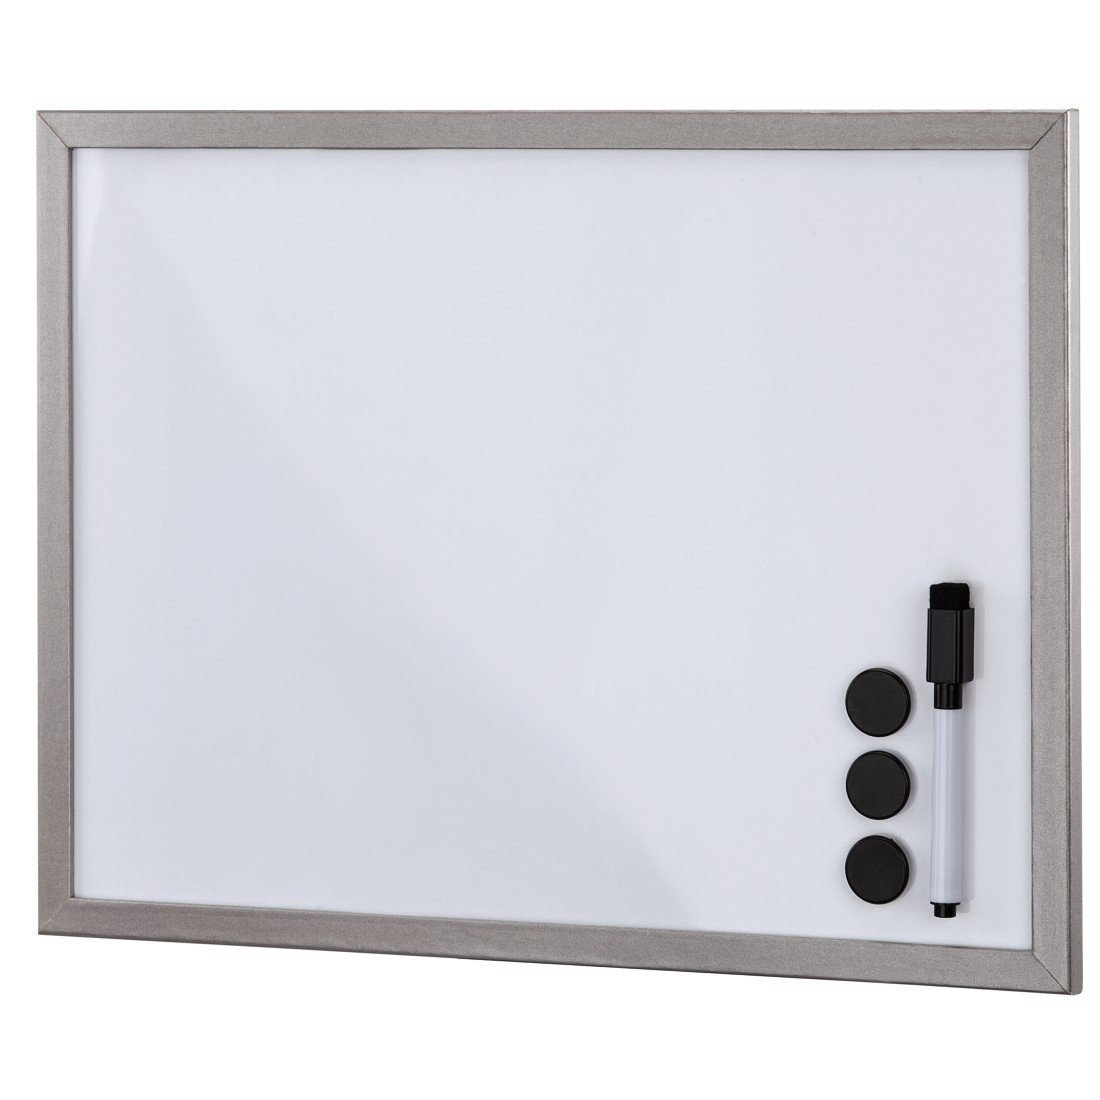 Hama Whiteboard 30x40cm Holz: Amazon.de: Elektronik